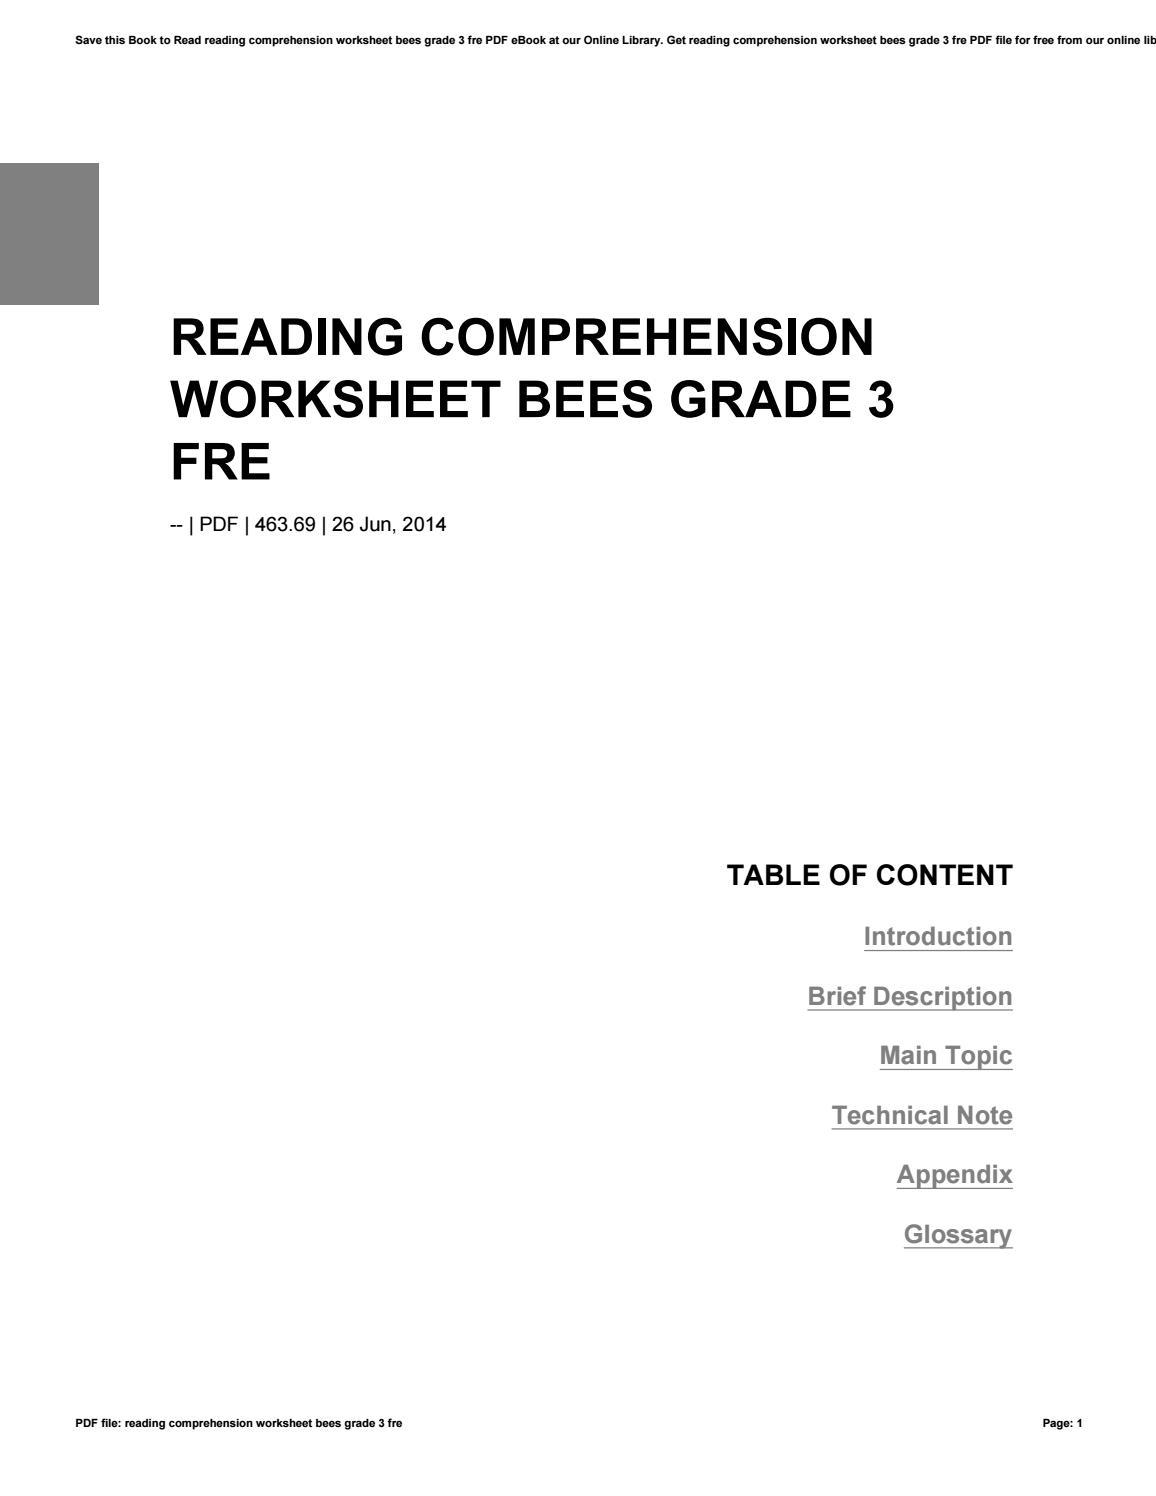 worksheet Reading Comprehension Worksheets Grade 3 reading comprehension worksheet bees grade 3 fre by dimas435anggara issuu